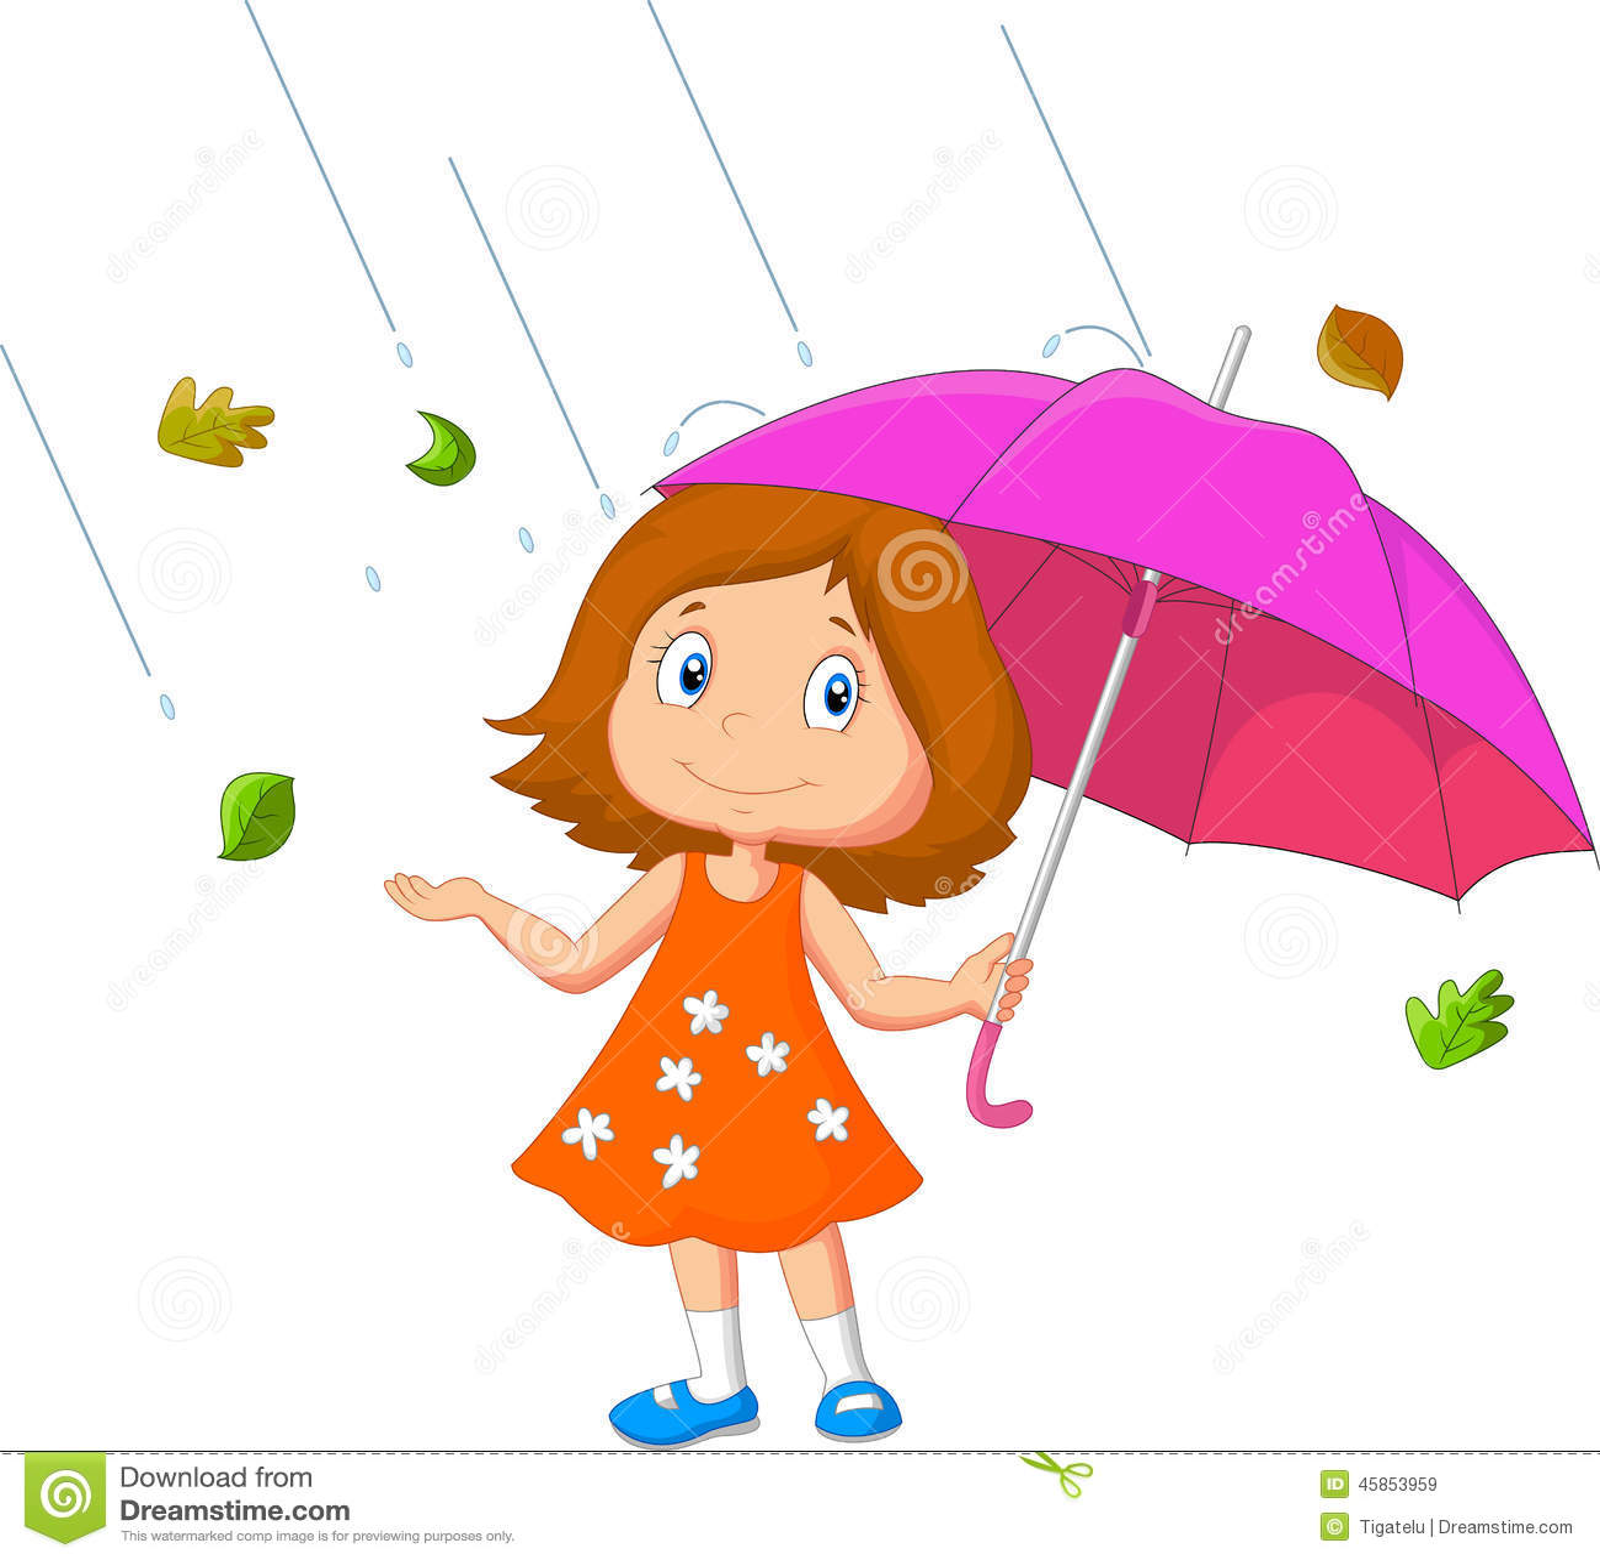 Girl Cartoon With Umbrella Stock Vector - Image: 45853959 Superhero Flying Vector